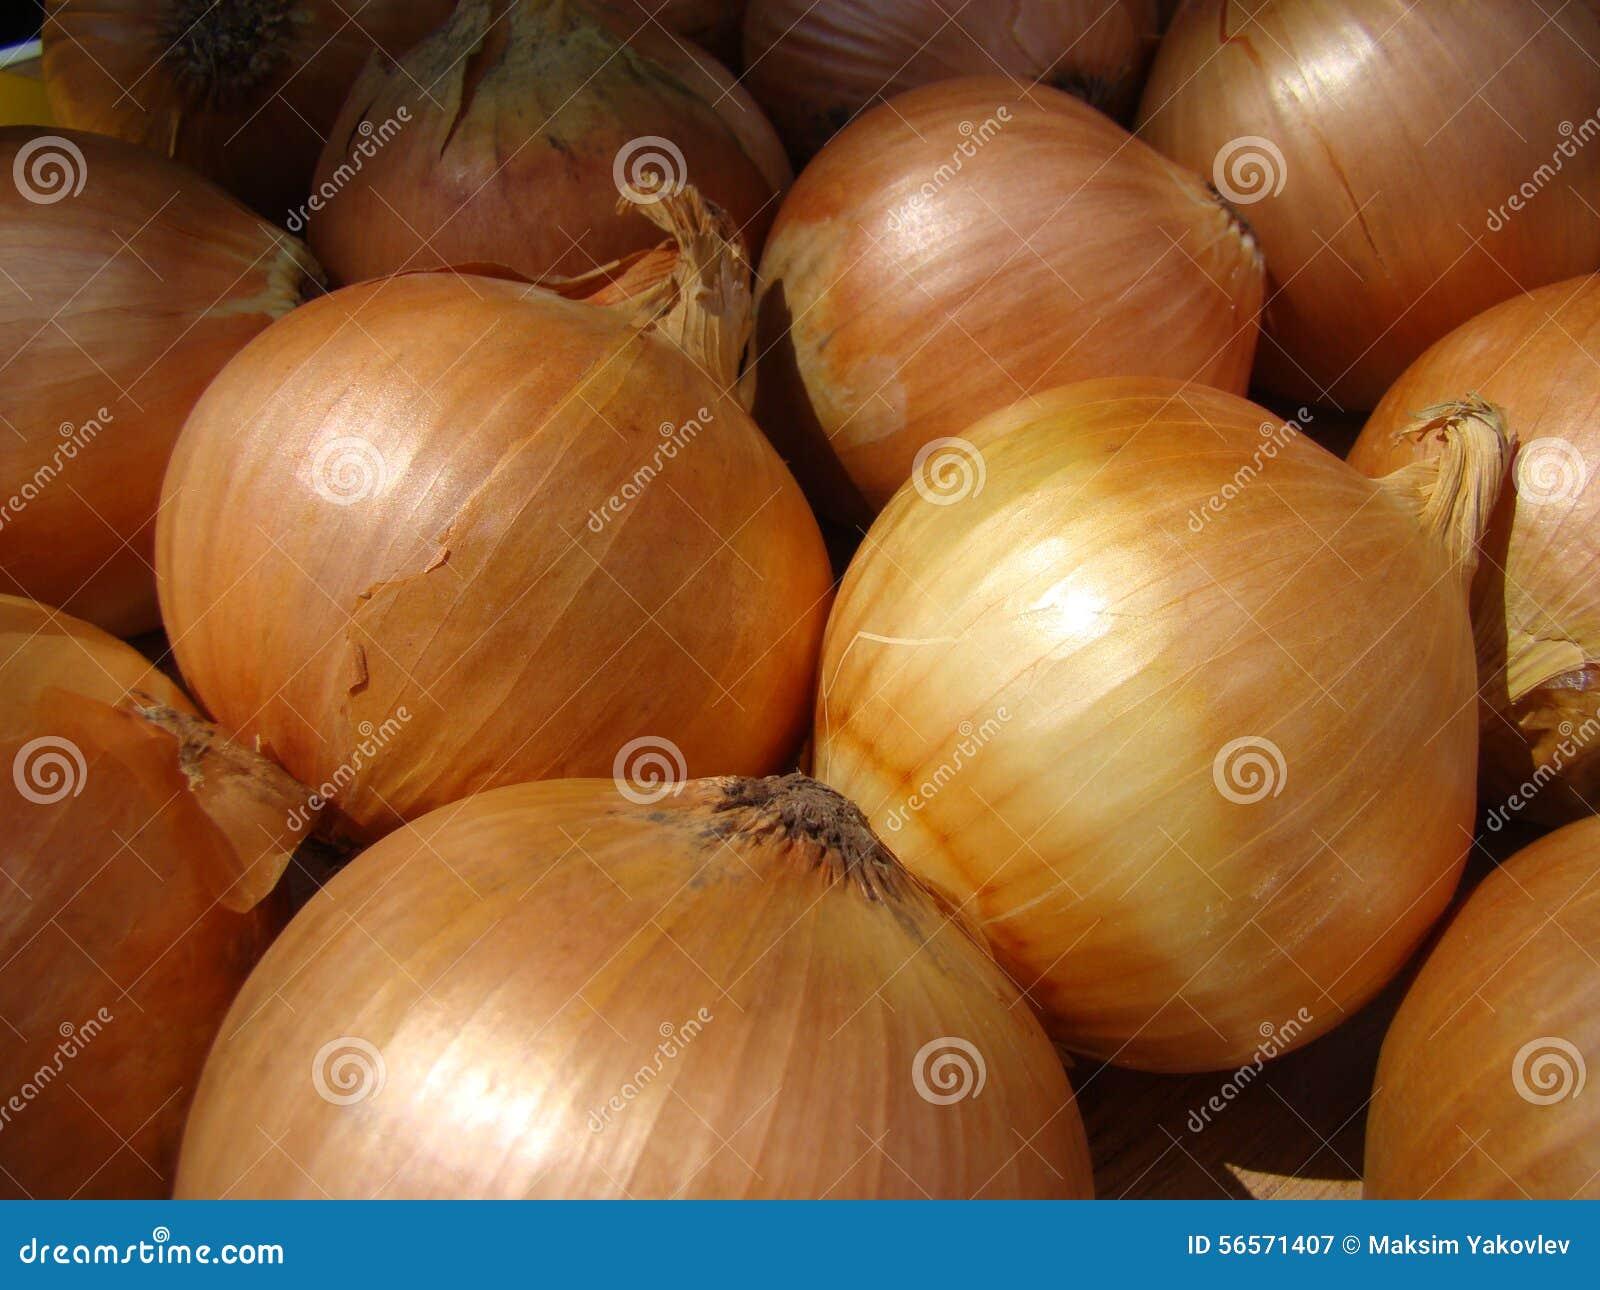 Download Κρεμμύδι στοκ εικόνα. εικόνα από καρύκευμα, οίστρο, κρεμμύδι - 56571407